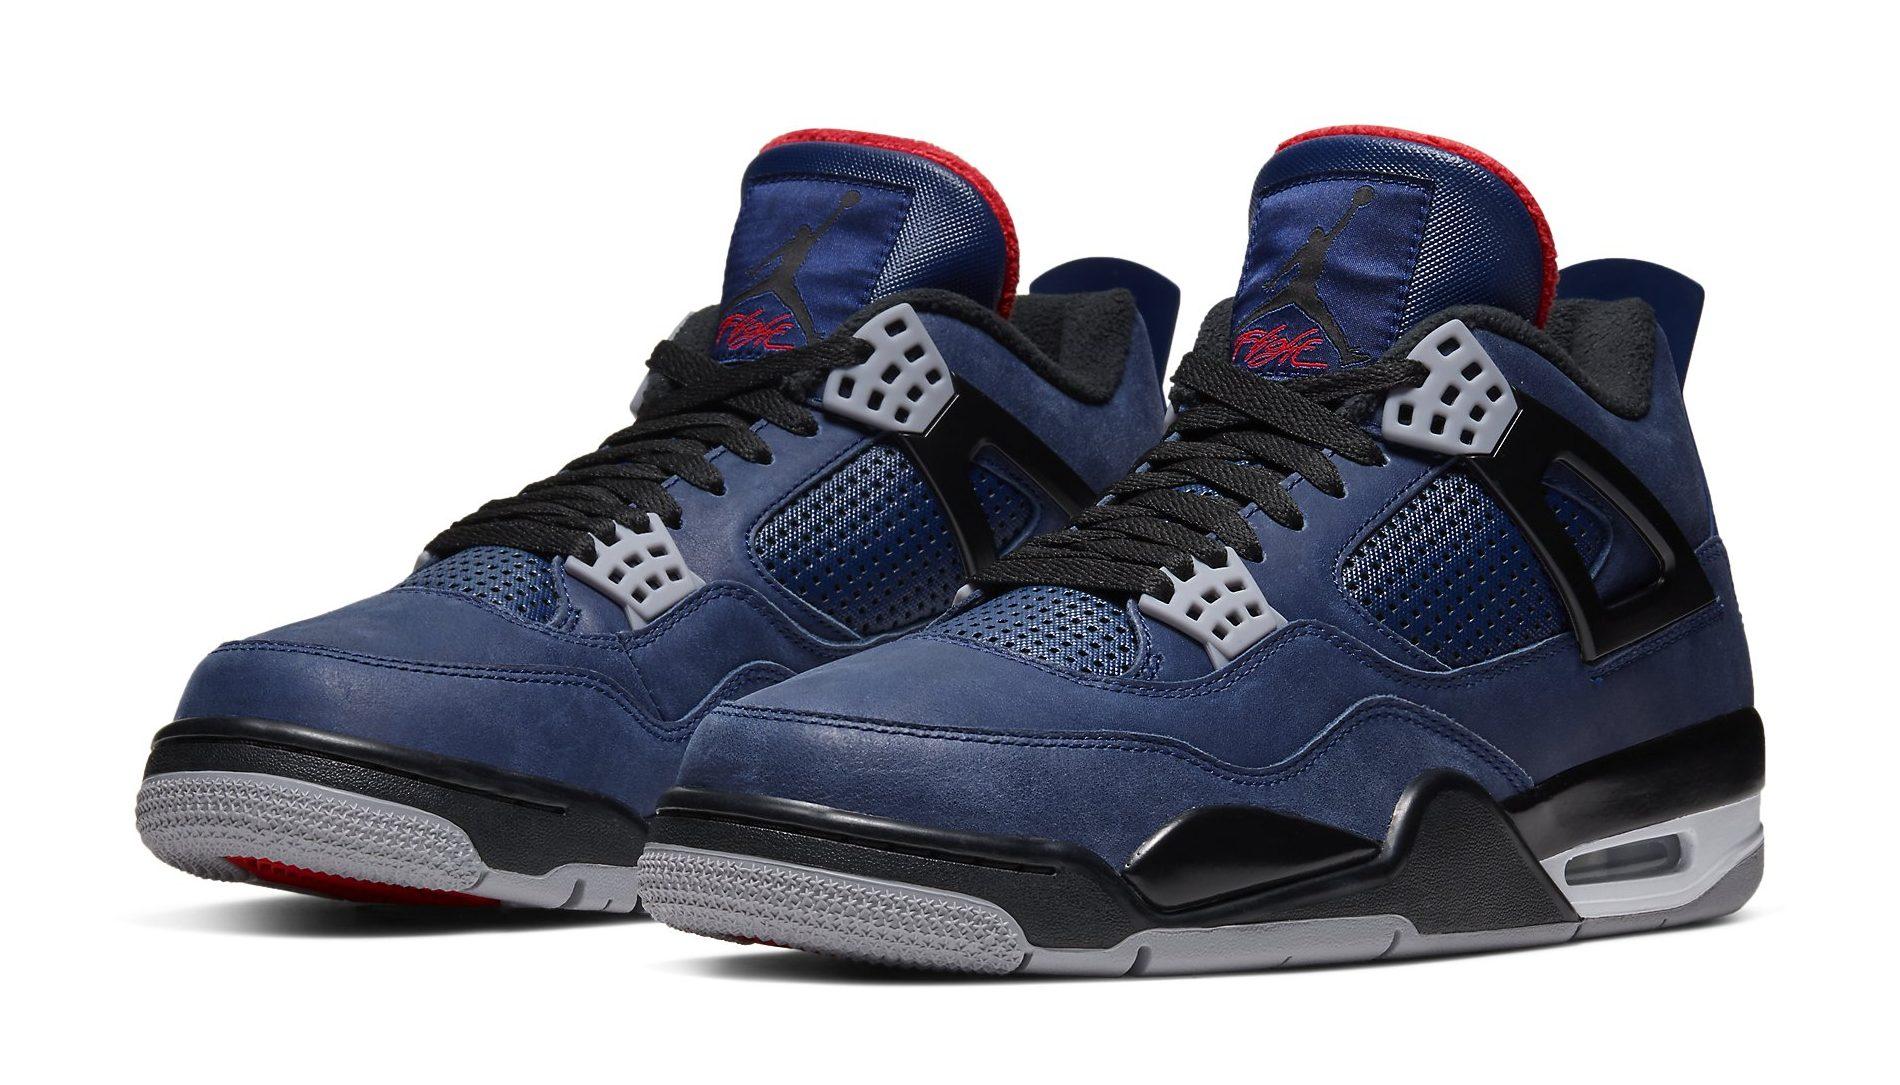 Air Jordan 4 WNTR 'Loyal Blue' Release